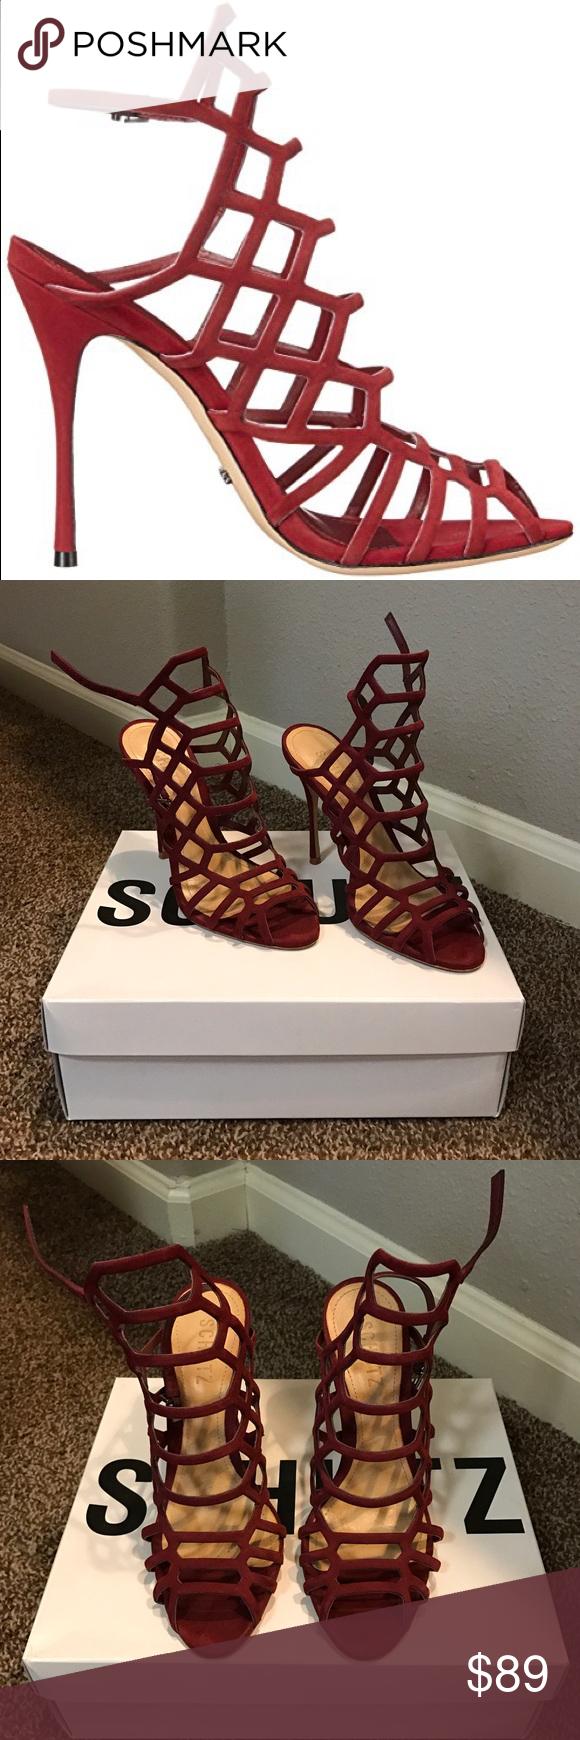 "Schutz Juliana Heels Gorgeous dark red Schutz heels!! About 4"", super cute, comfortable. Worn 3-4 times. In great condition! True to size SCHUTZ Shoes Heels"